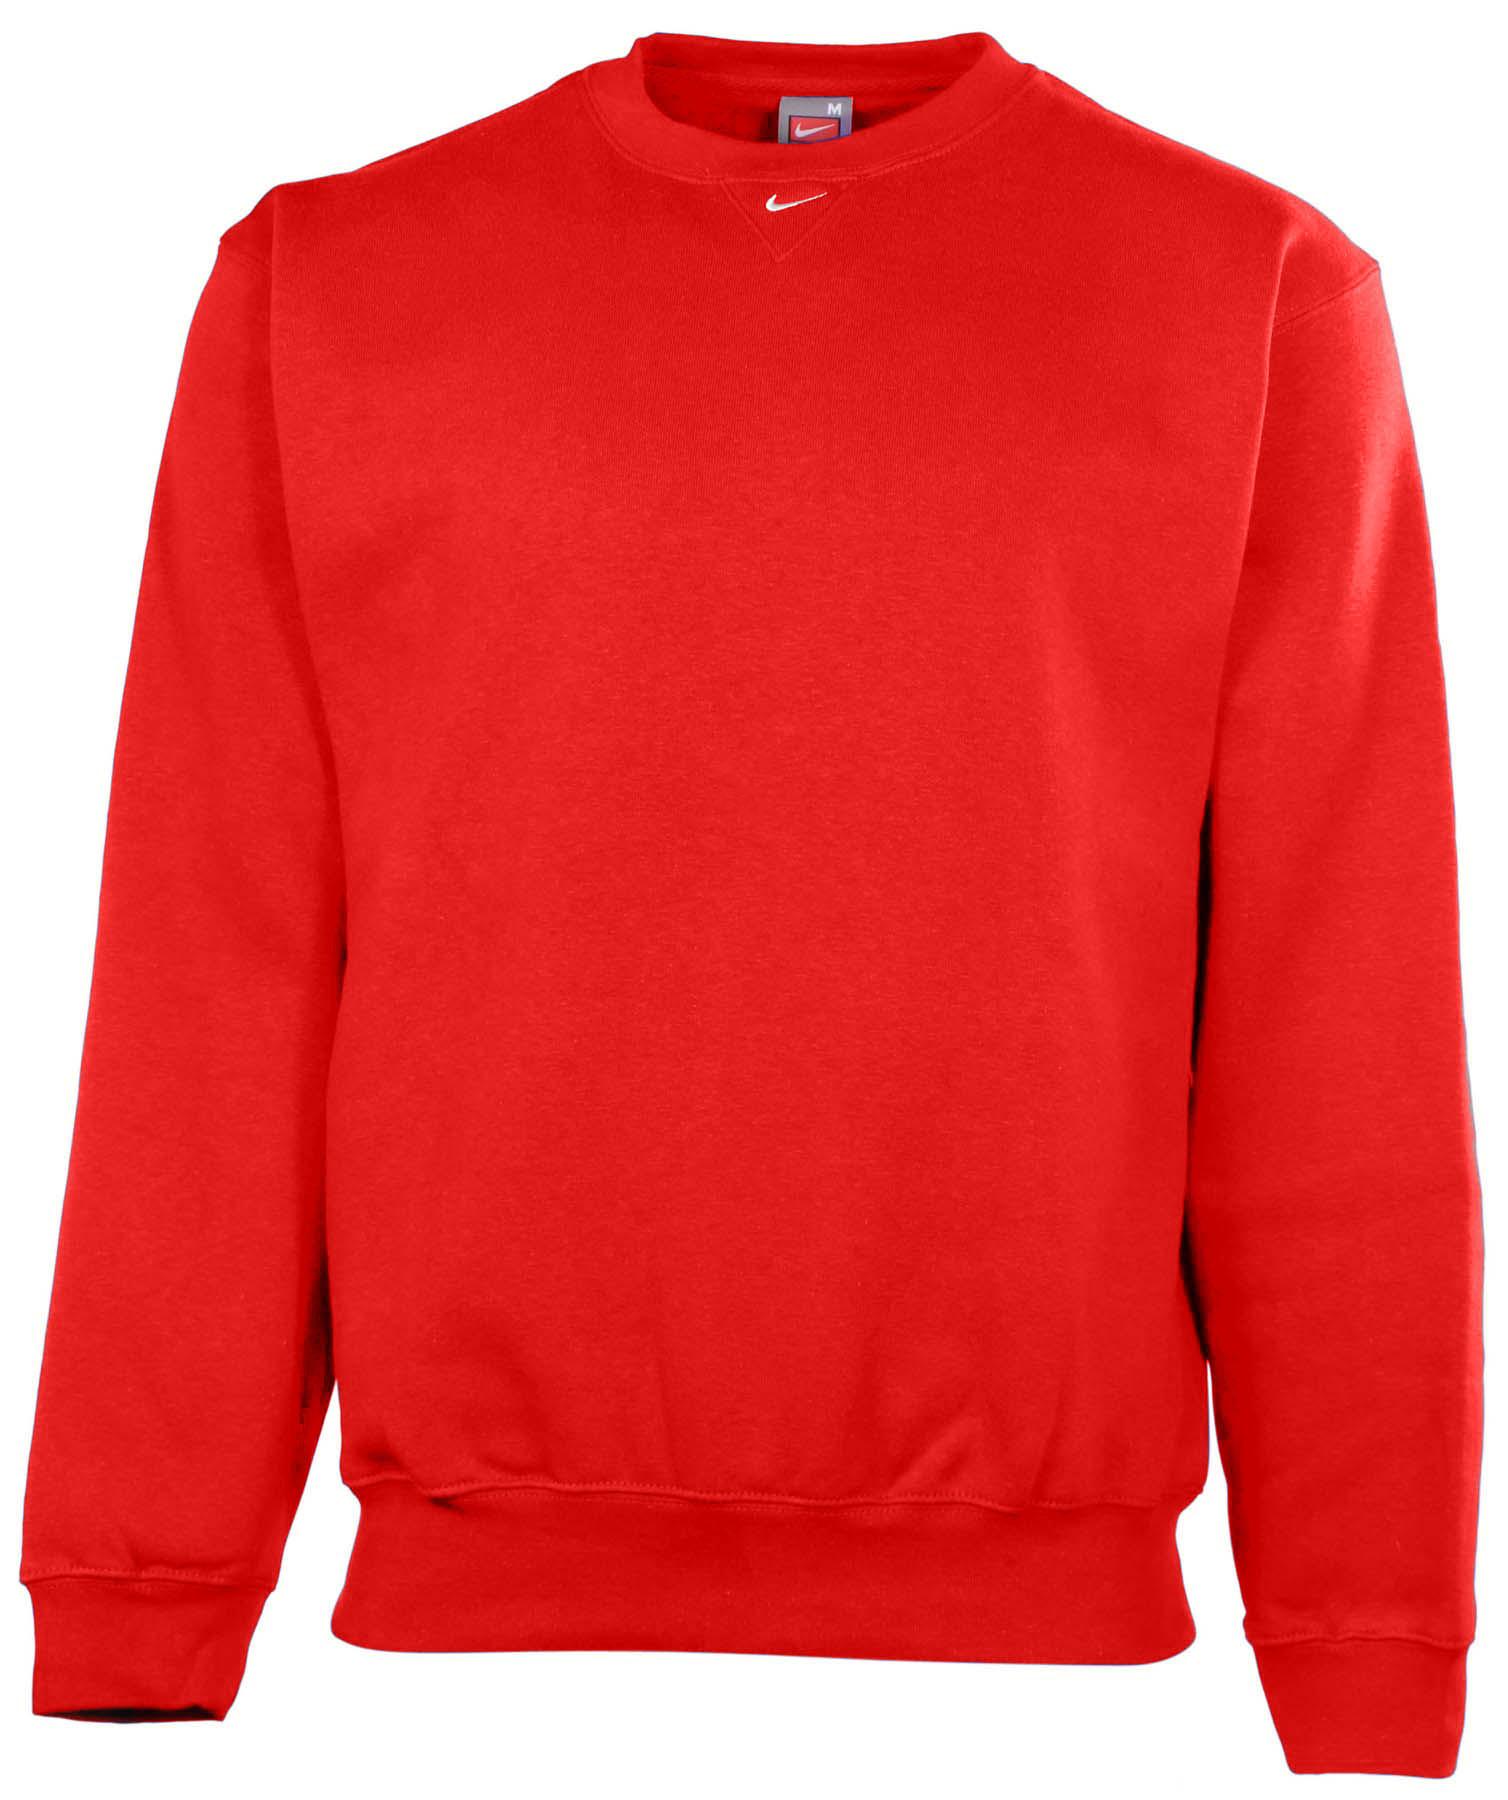 nike men 39 s team crew neck fleece pullover sweatshirt ebay. Black Bedroom Furniture Sets. Home Design Ideas